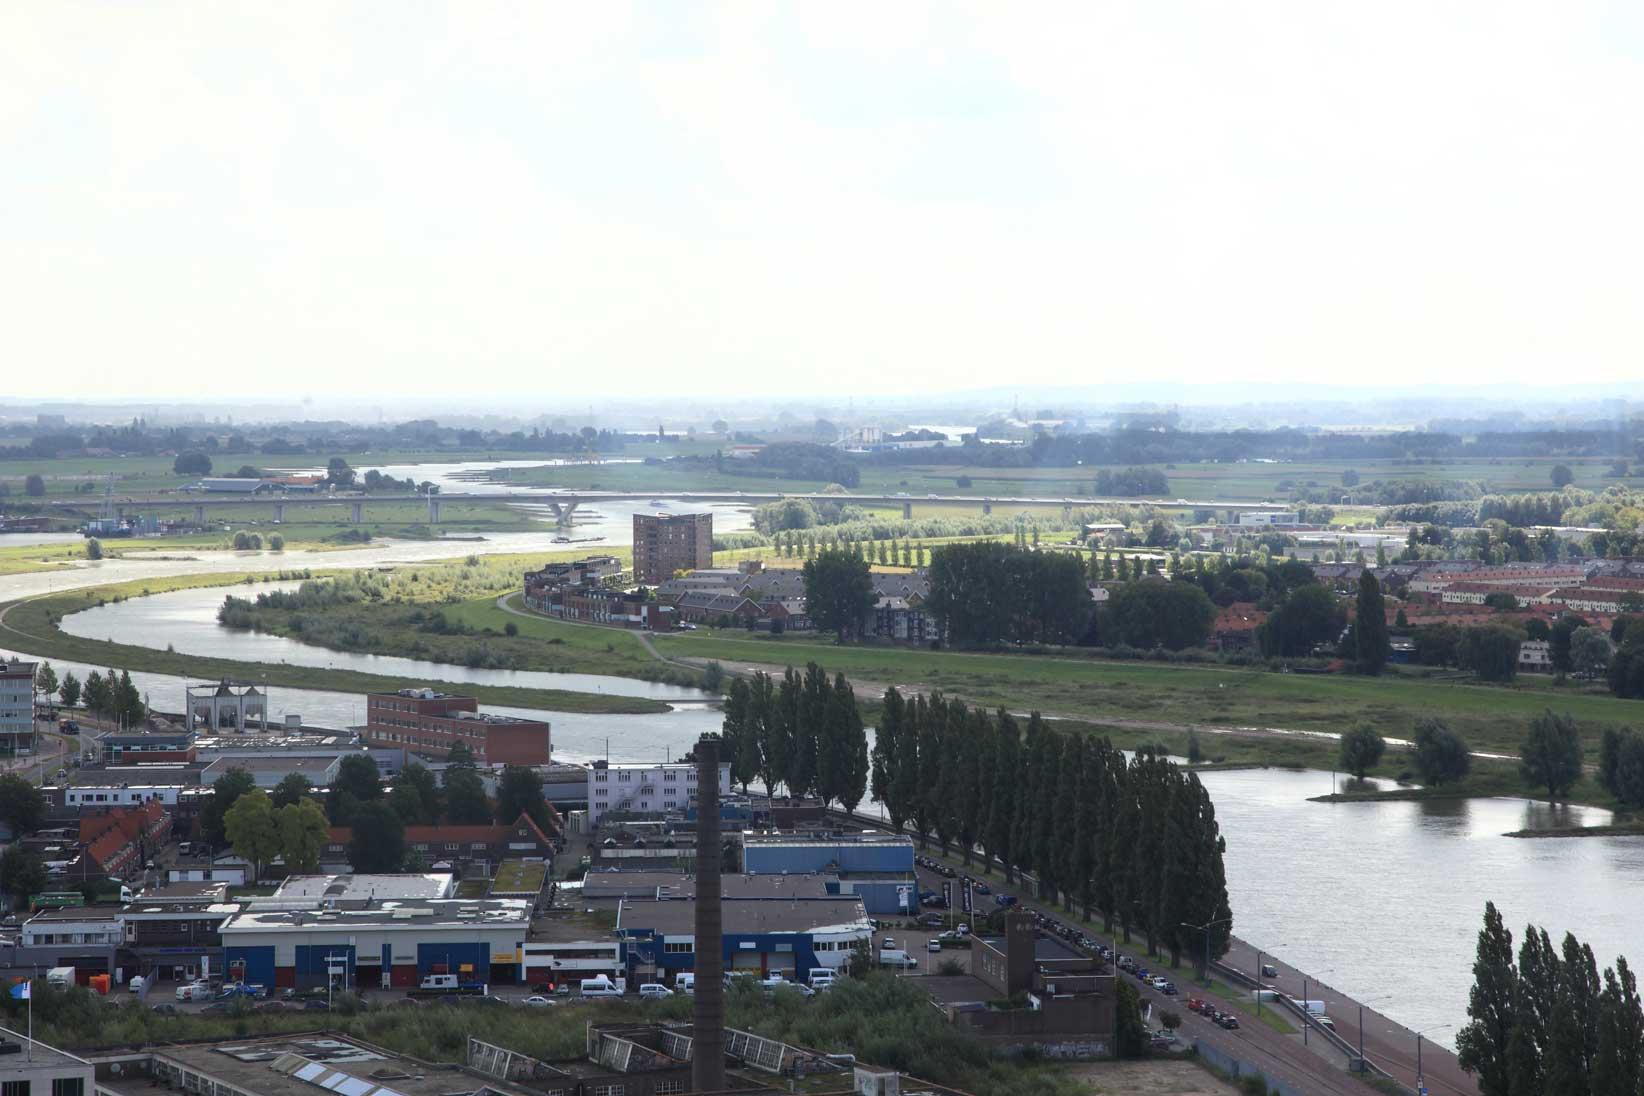 Rhine-20-08-14_14-14-48